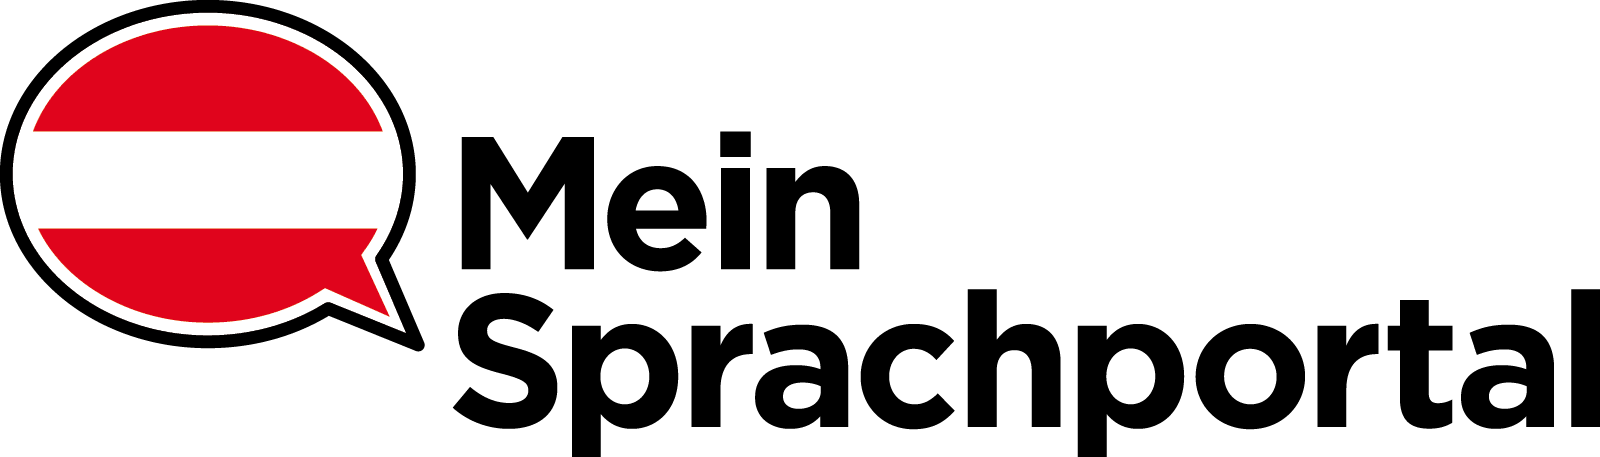 Mein Sprachportal - ÖIF Sprachportal